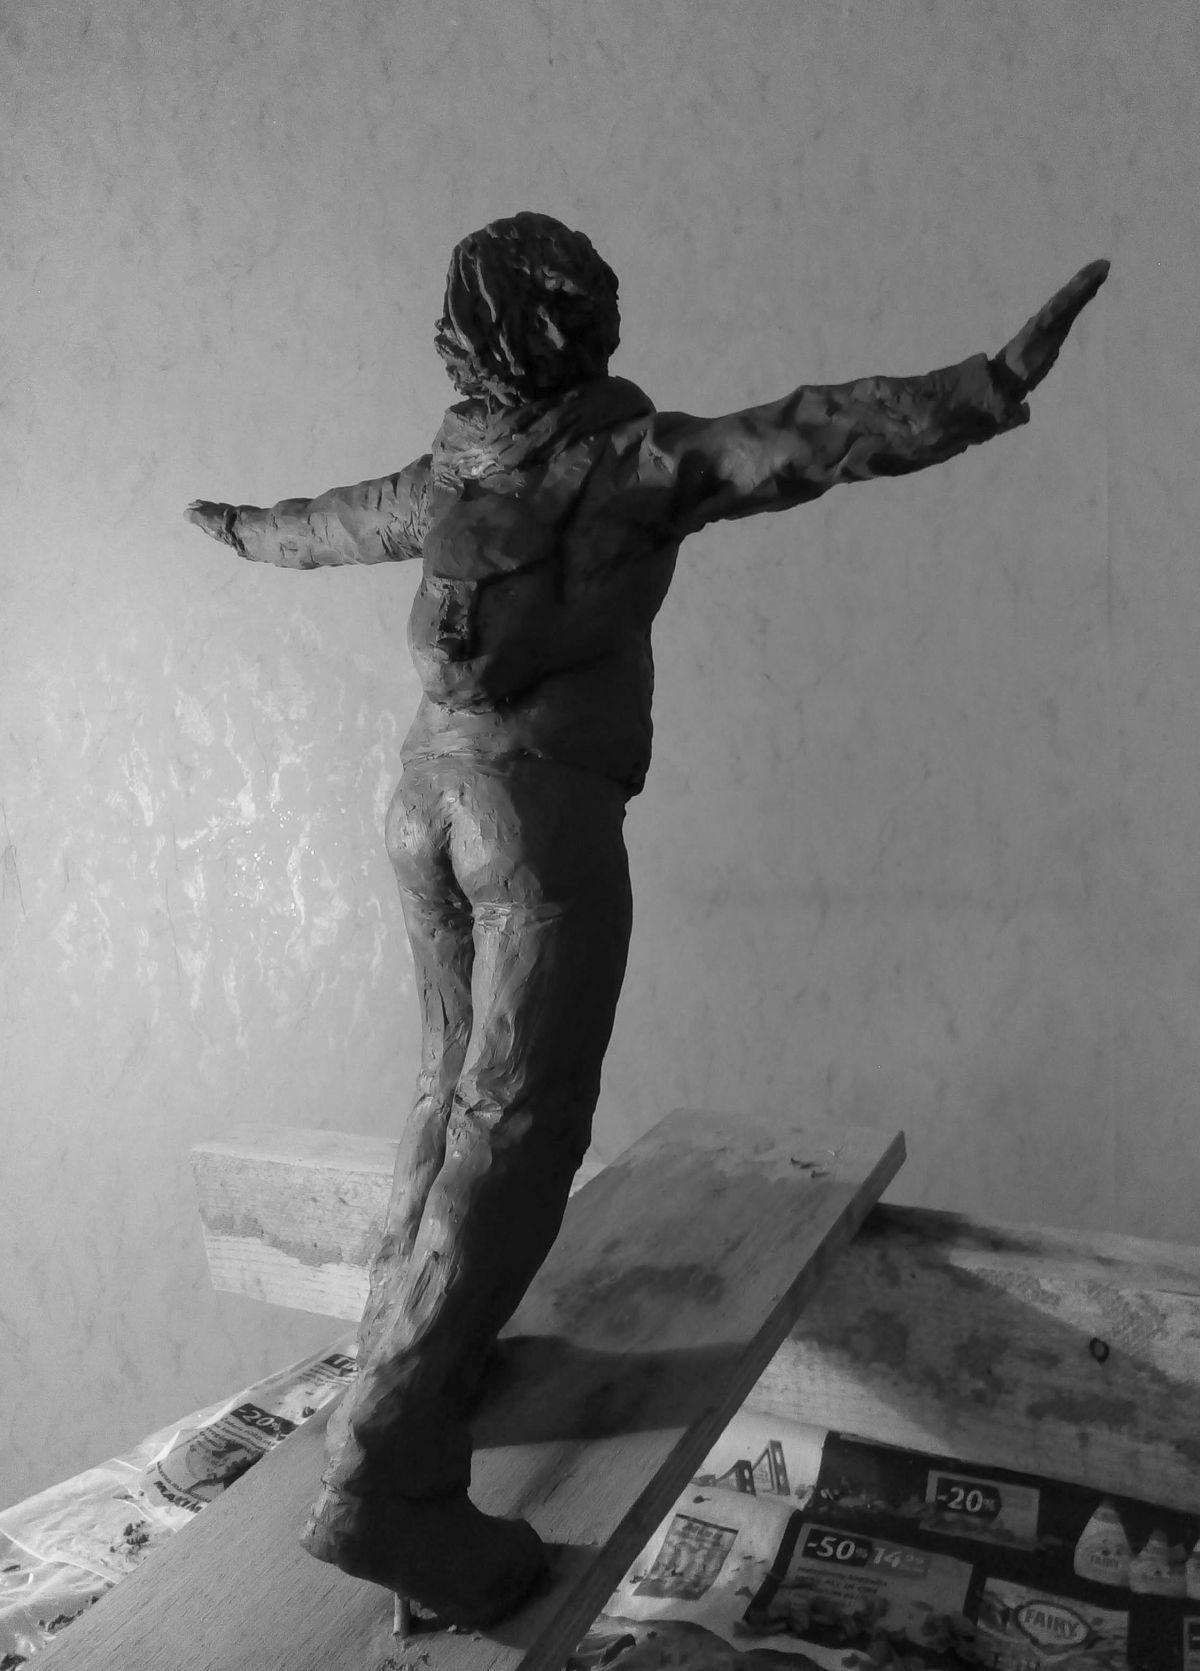 Эскиз памятника Ирине Славиной. Глина, 25 см. © Виктор Корб, 2021. Вид в три четверти, сзади, справа.